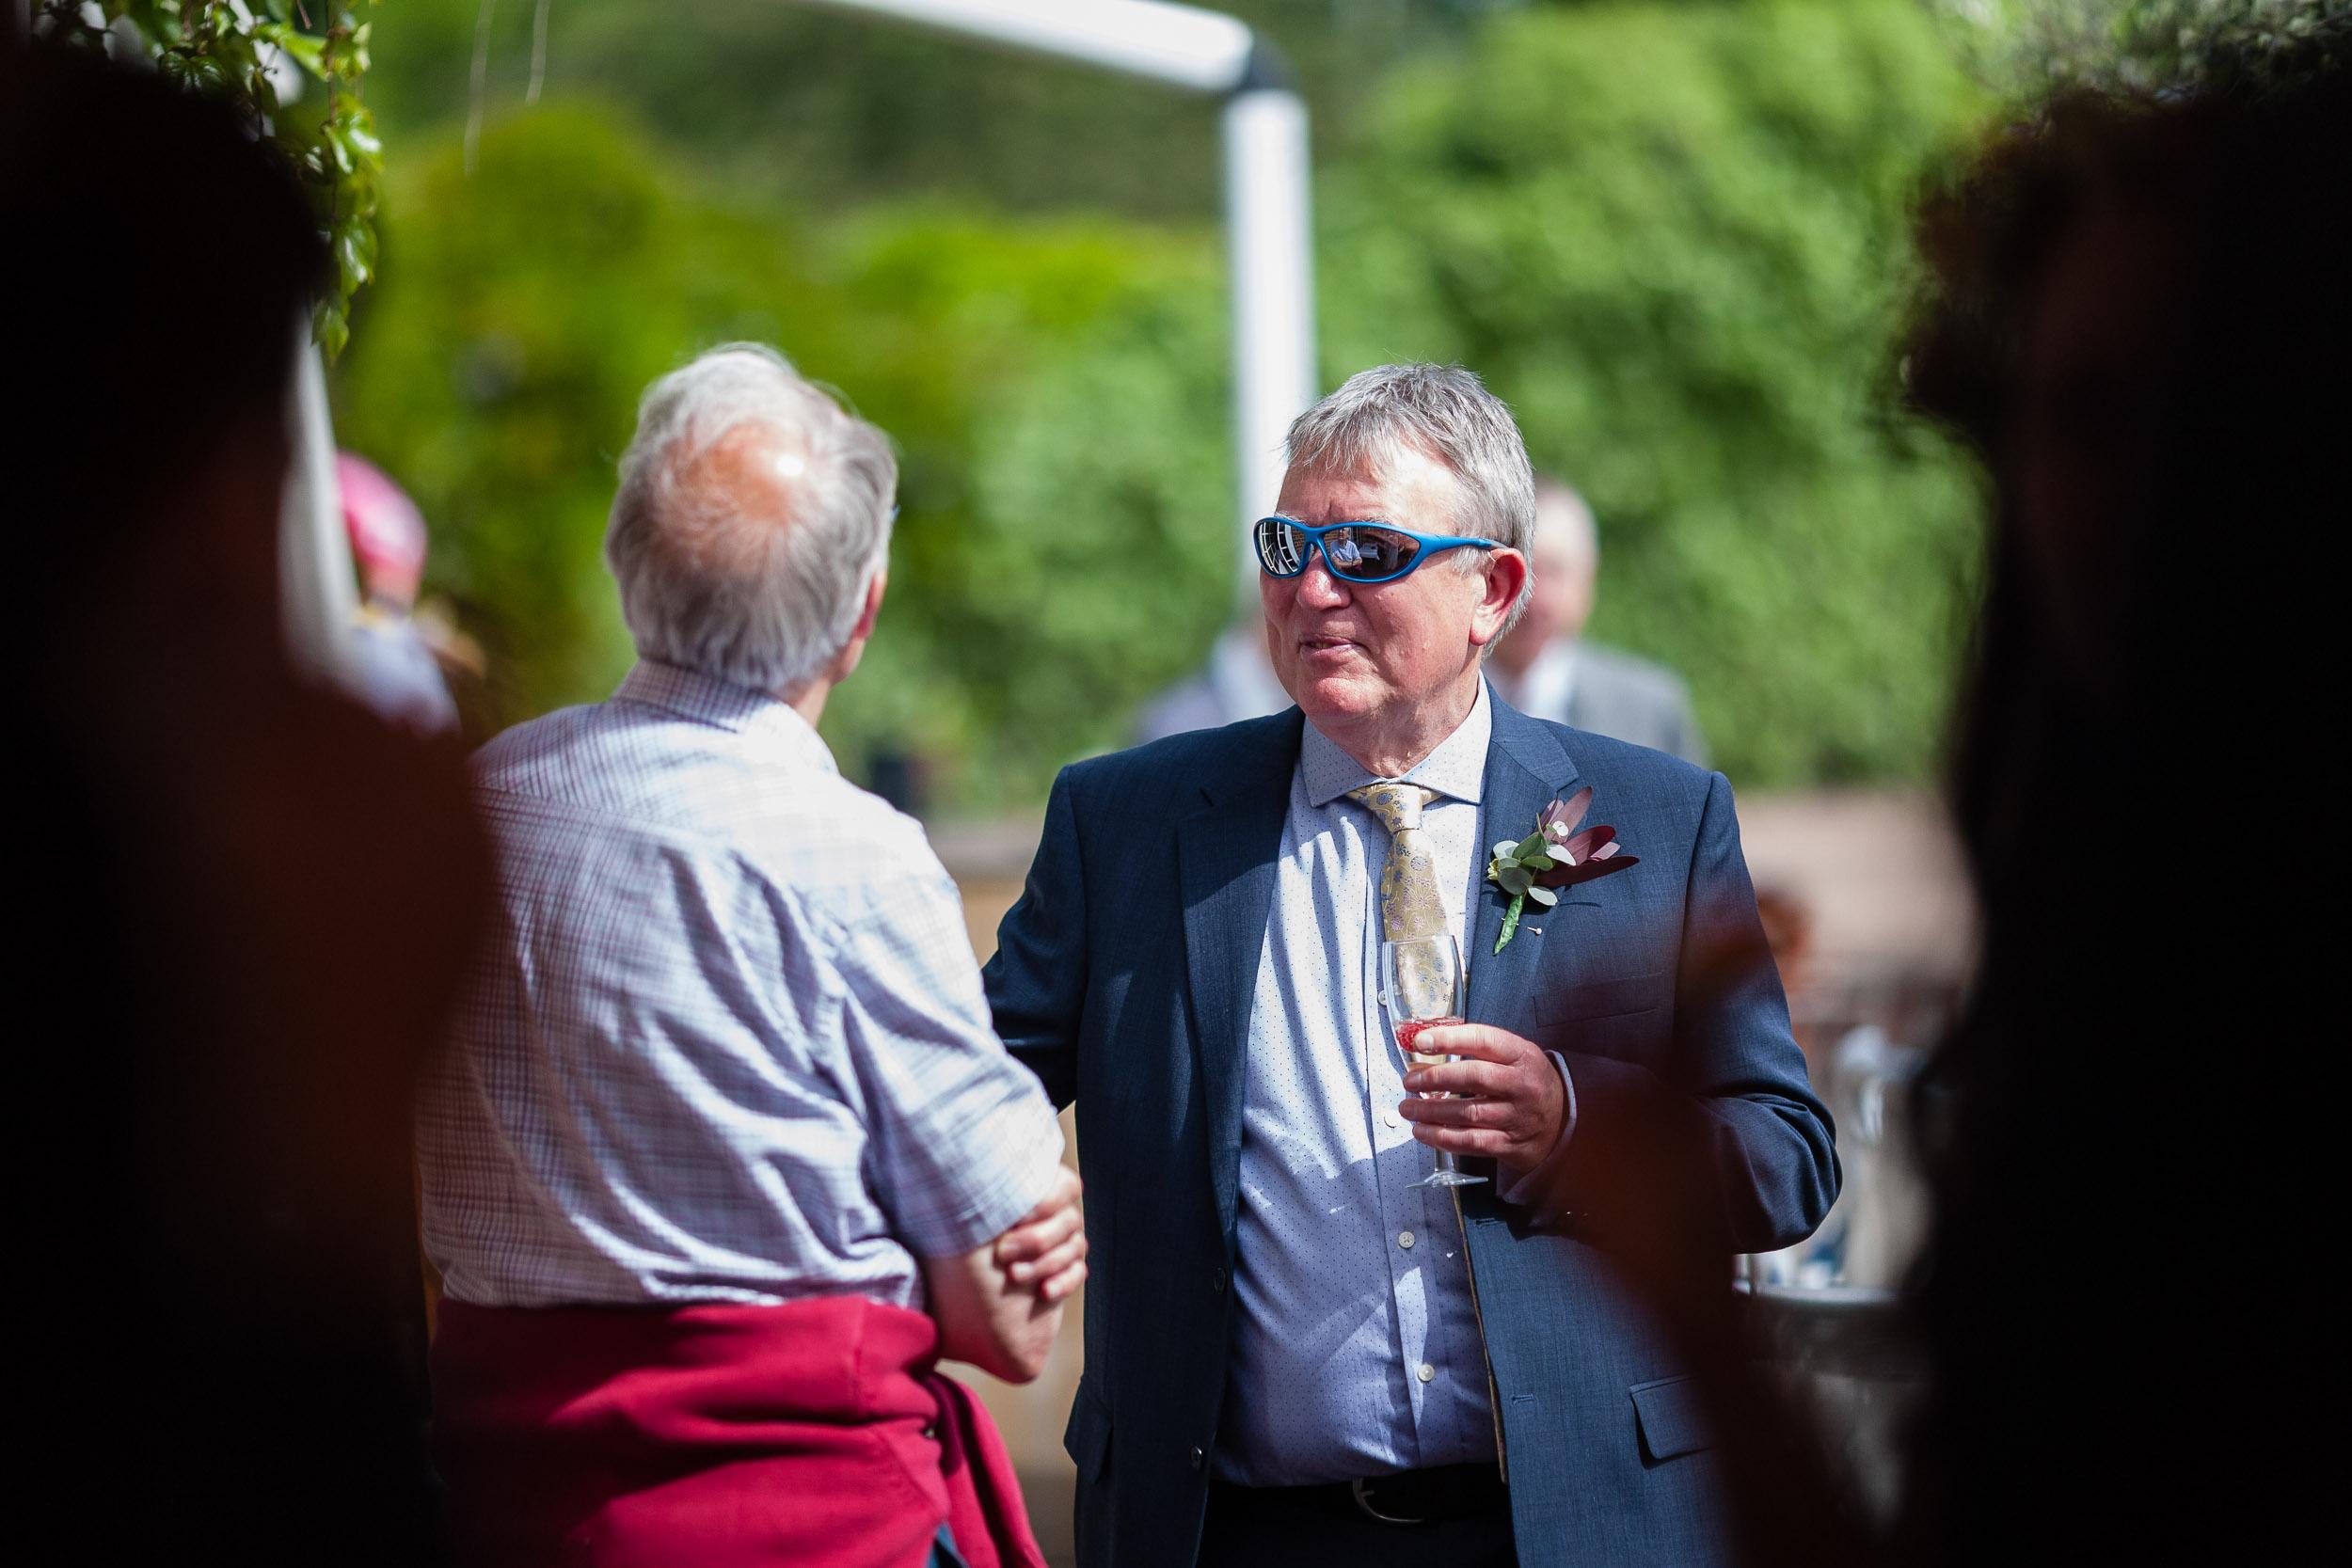 brockwell-lido-brixton-herne-hill-wedding-231.jpg